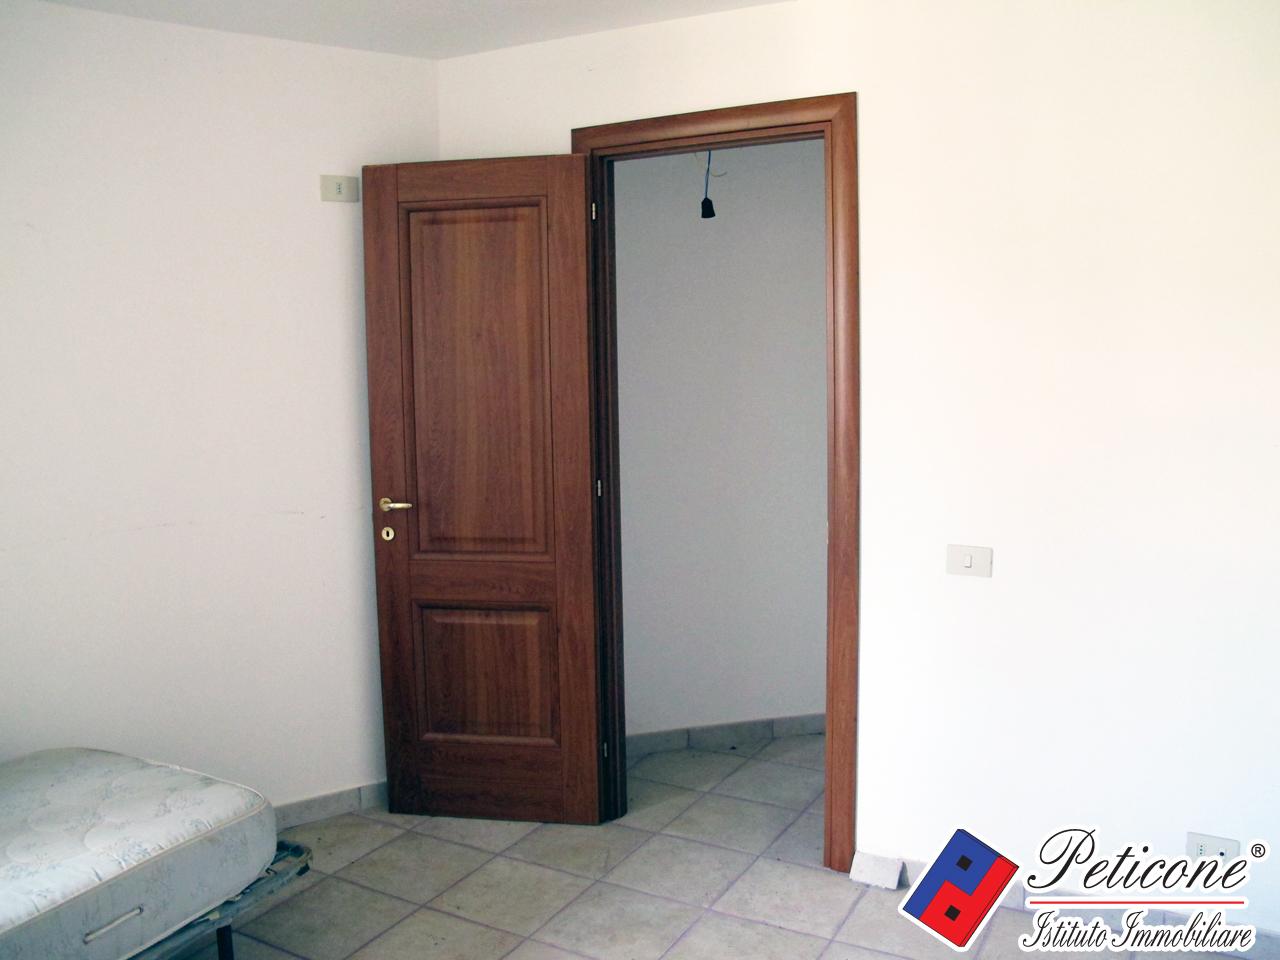 Appartamento in Vendita a Sperlonga: 1 locali, 45 mq - Foto 7